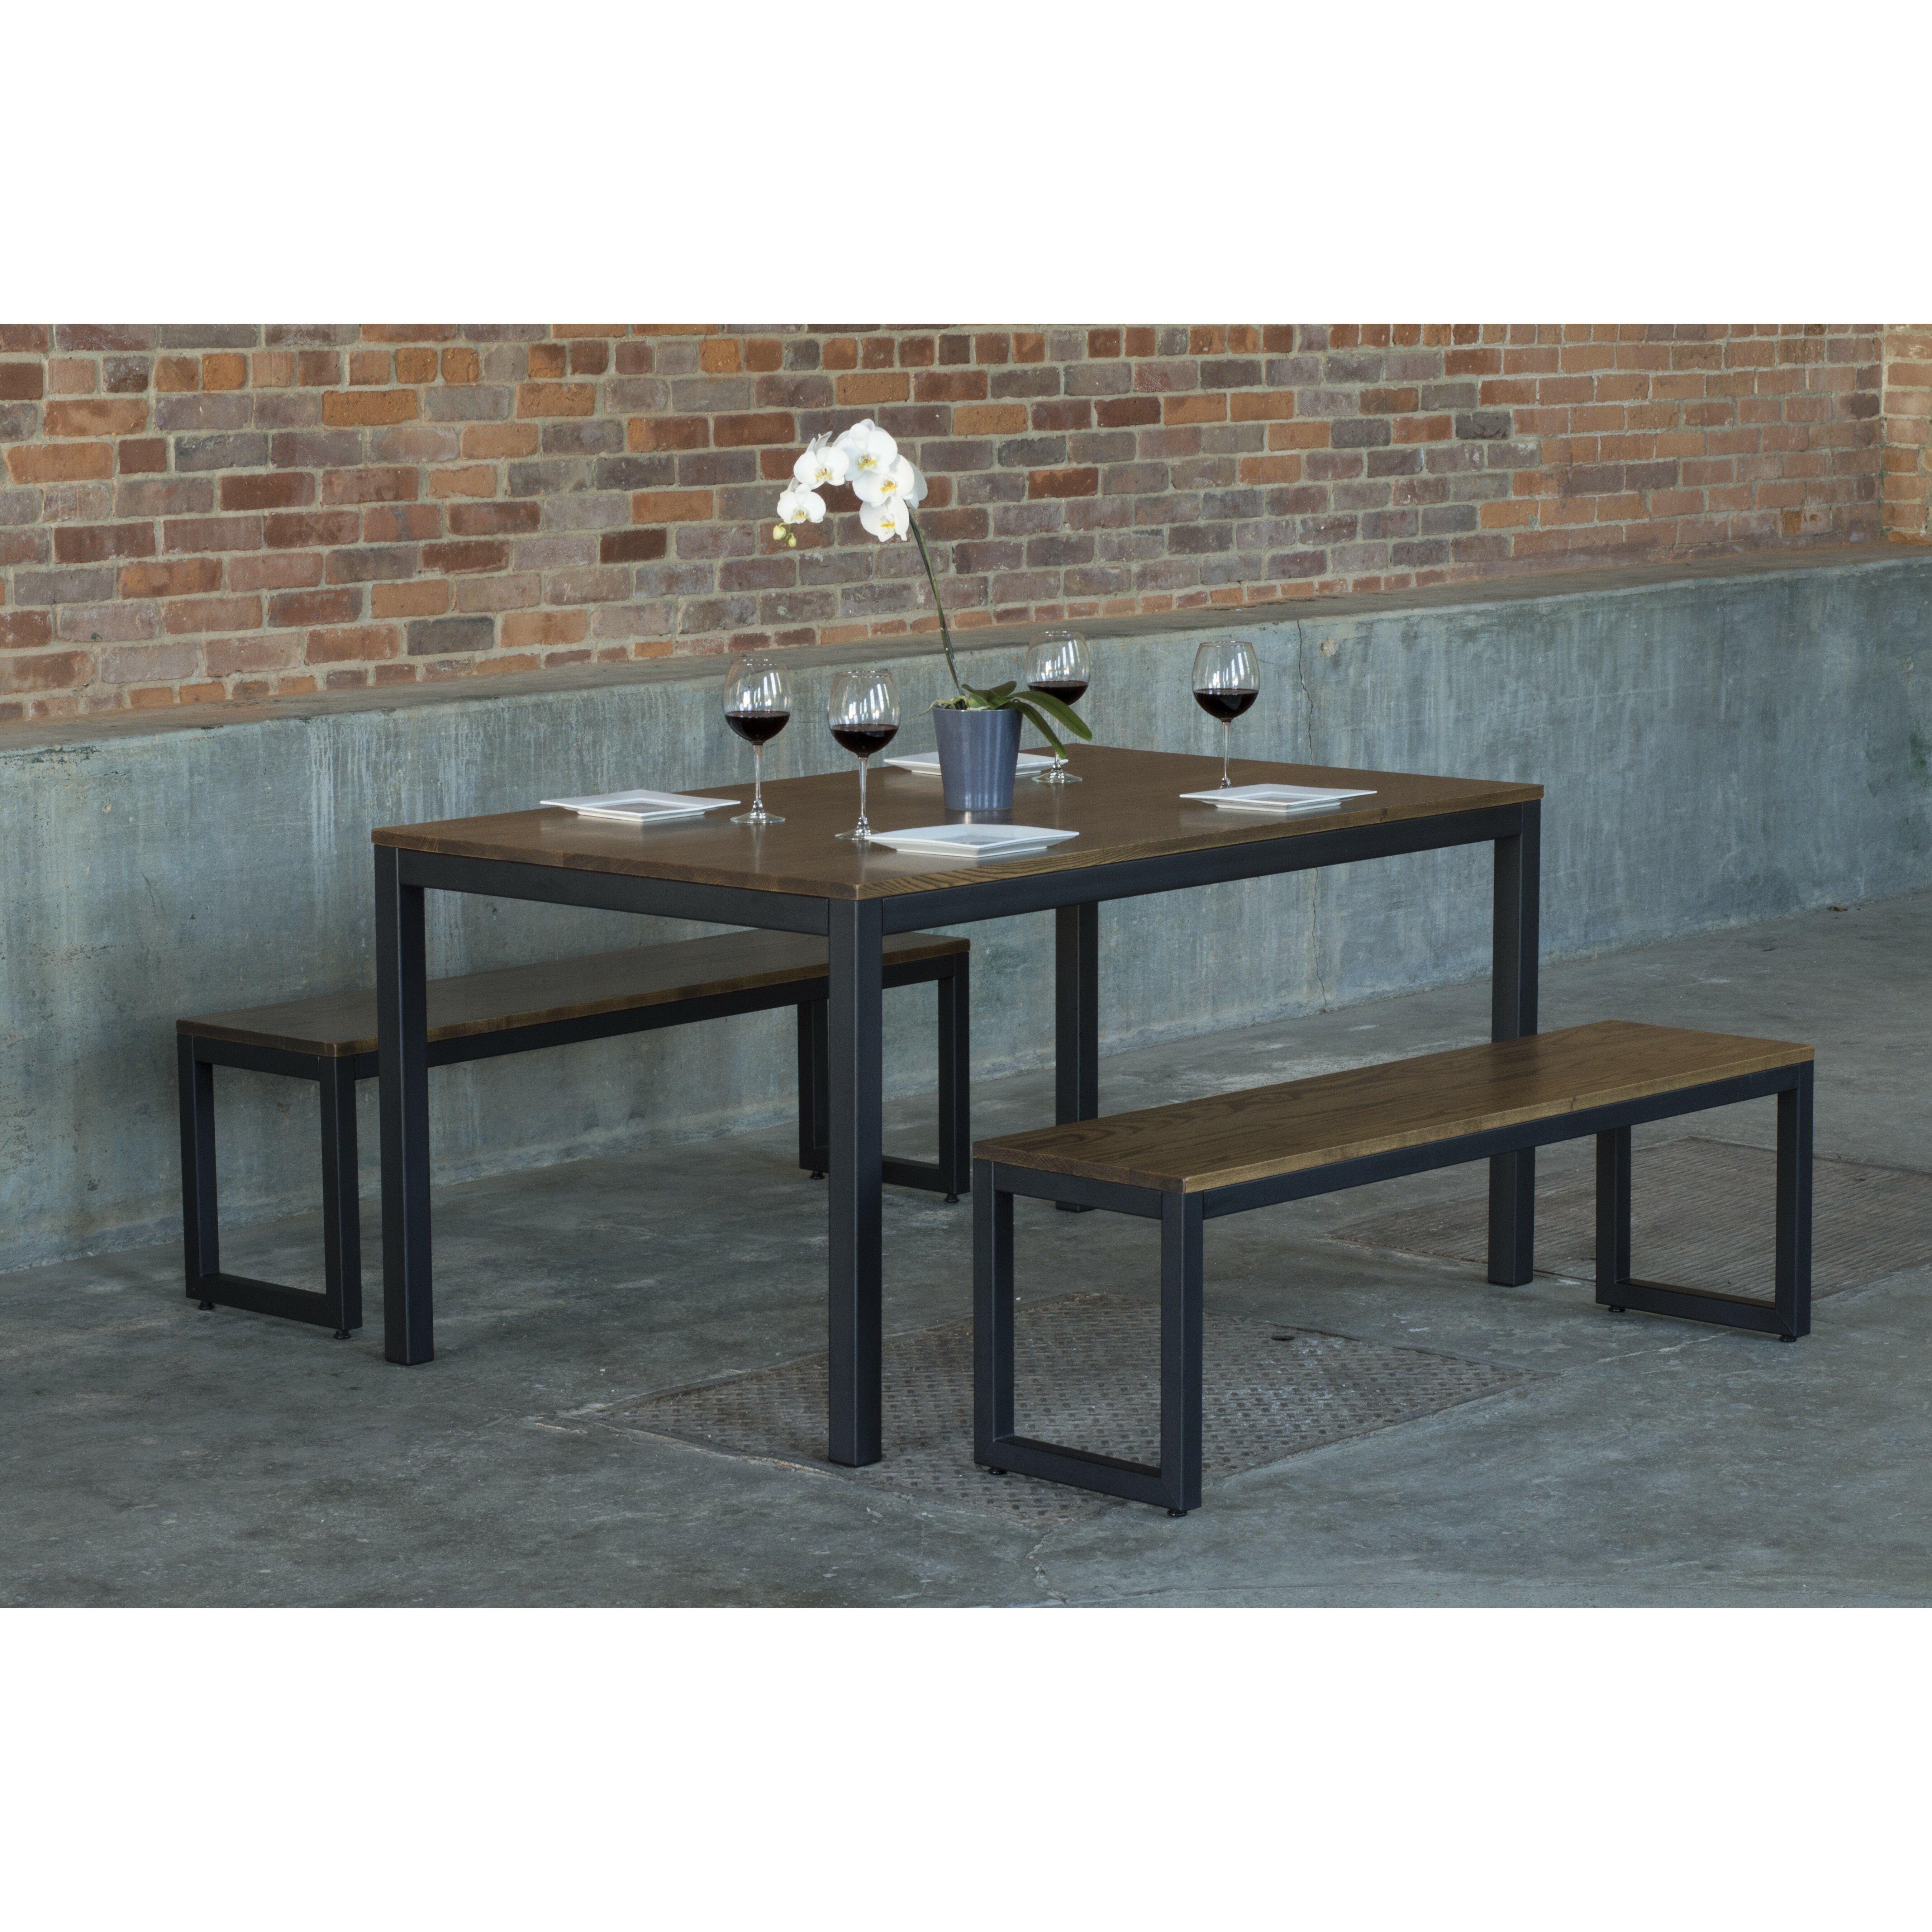 Elan Furniture Loft Dining Table amp Reviews Wayfair : Elan Furniture Loft Dining Table from www.wayfair.com size 5390 x 5390 jpeg 3779kB